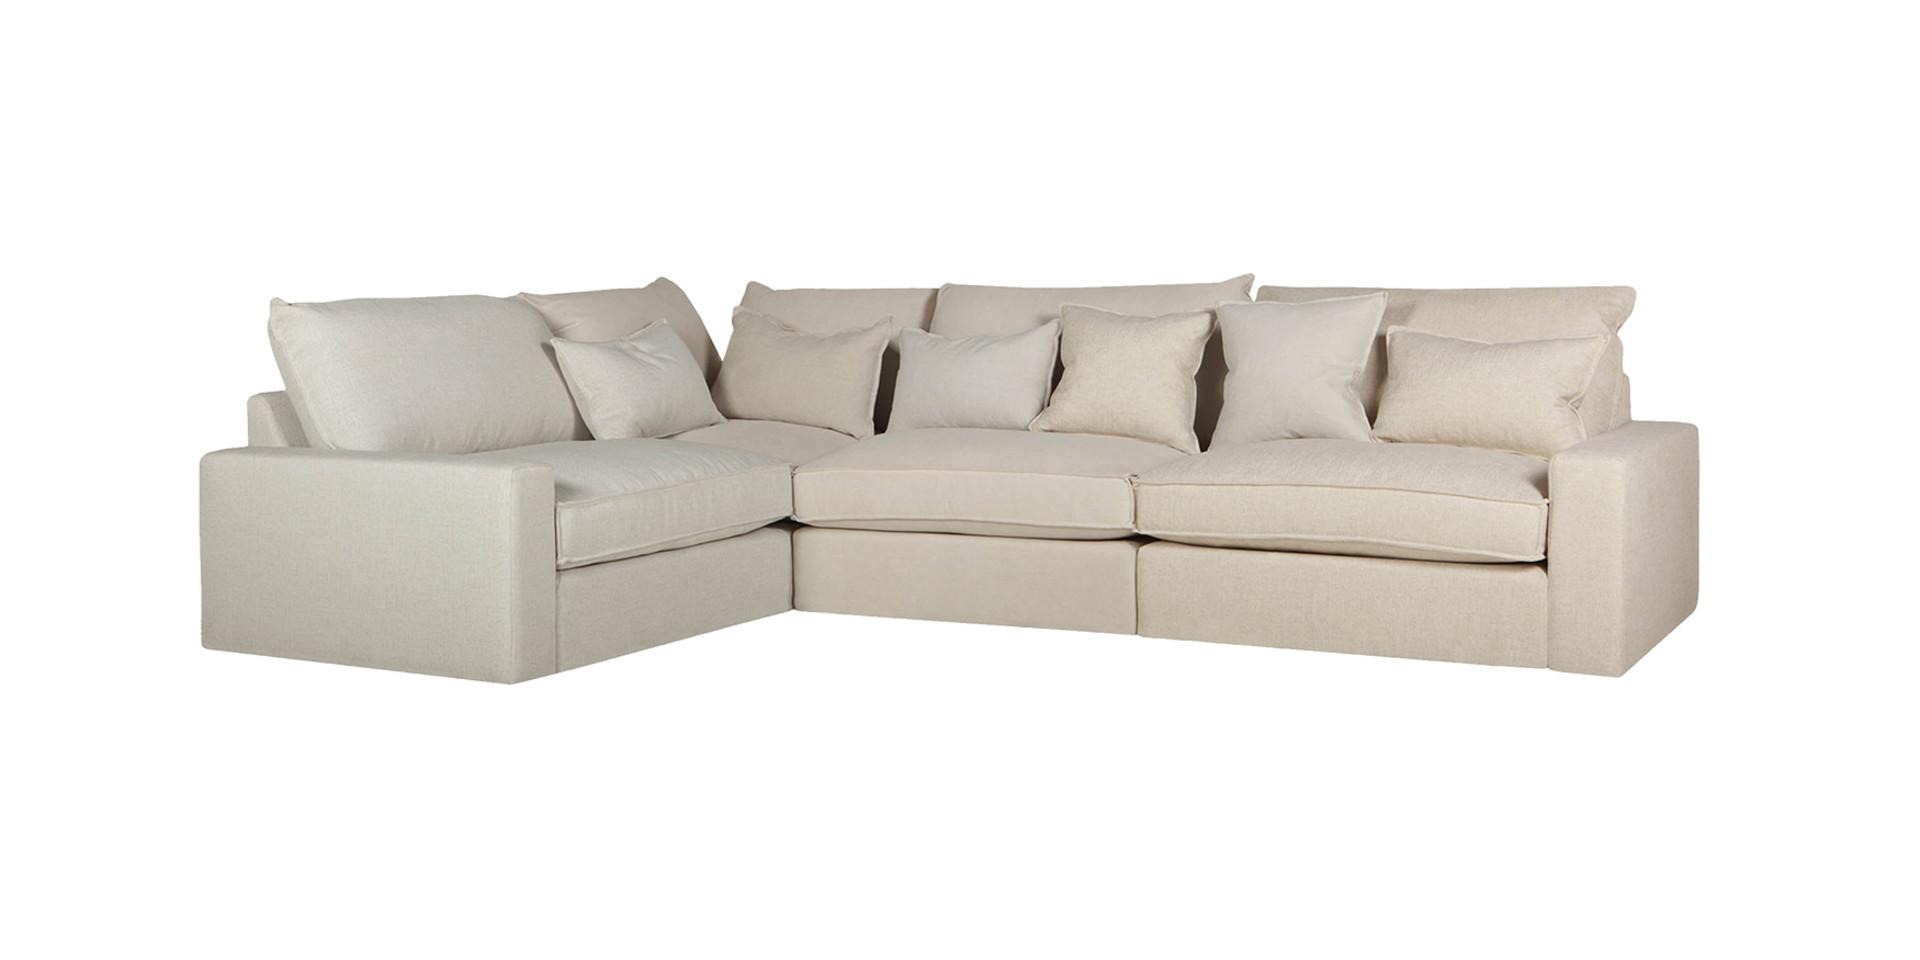 sits-oscar-angle-armchairx3_corner90_acker1_natur_nancy1_natur_caleido1419_natur_2